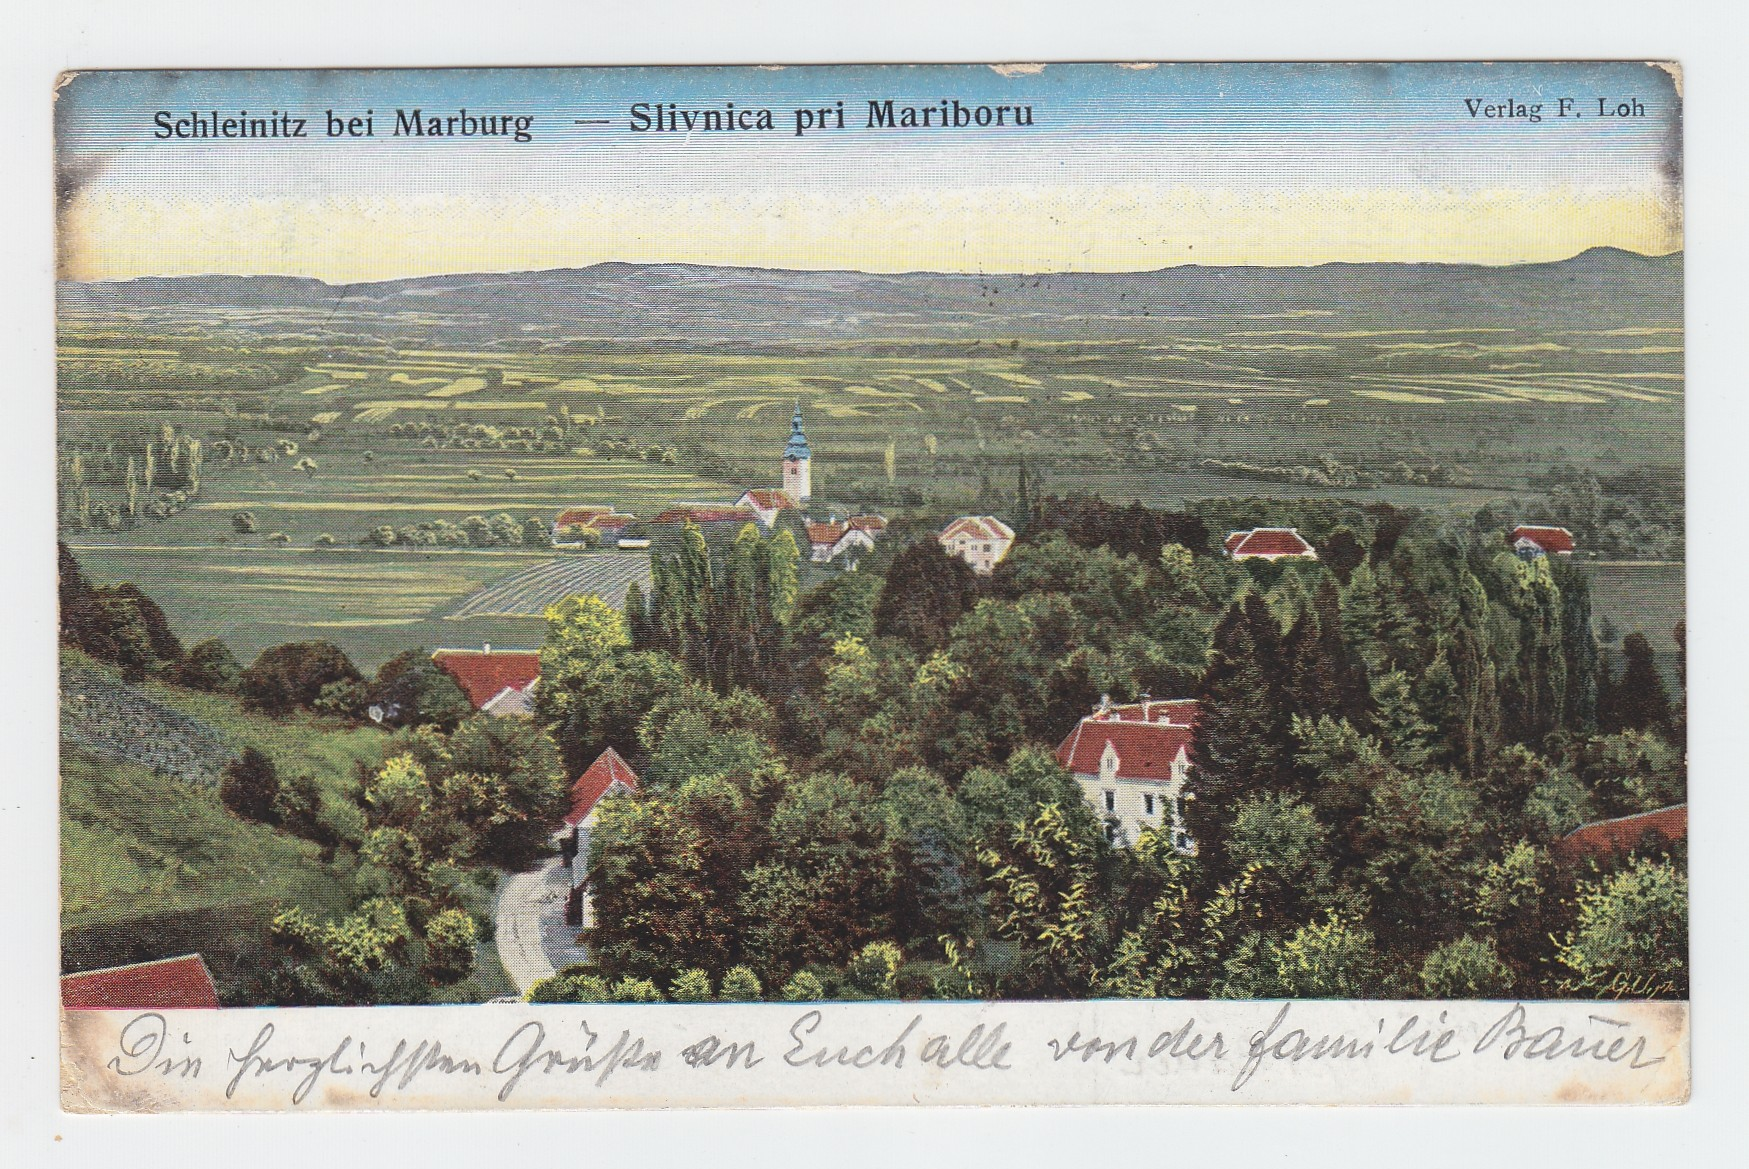 Schleinitz bei Marburg - Slivnica pri Mariboru.